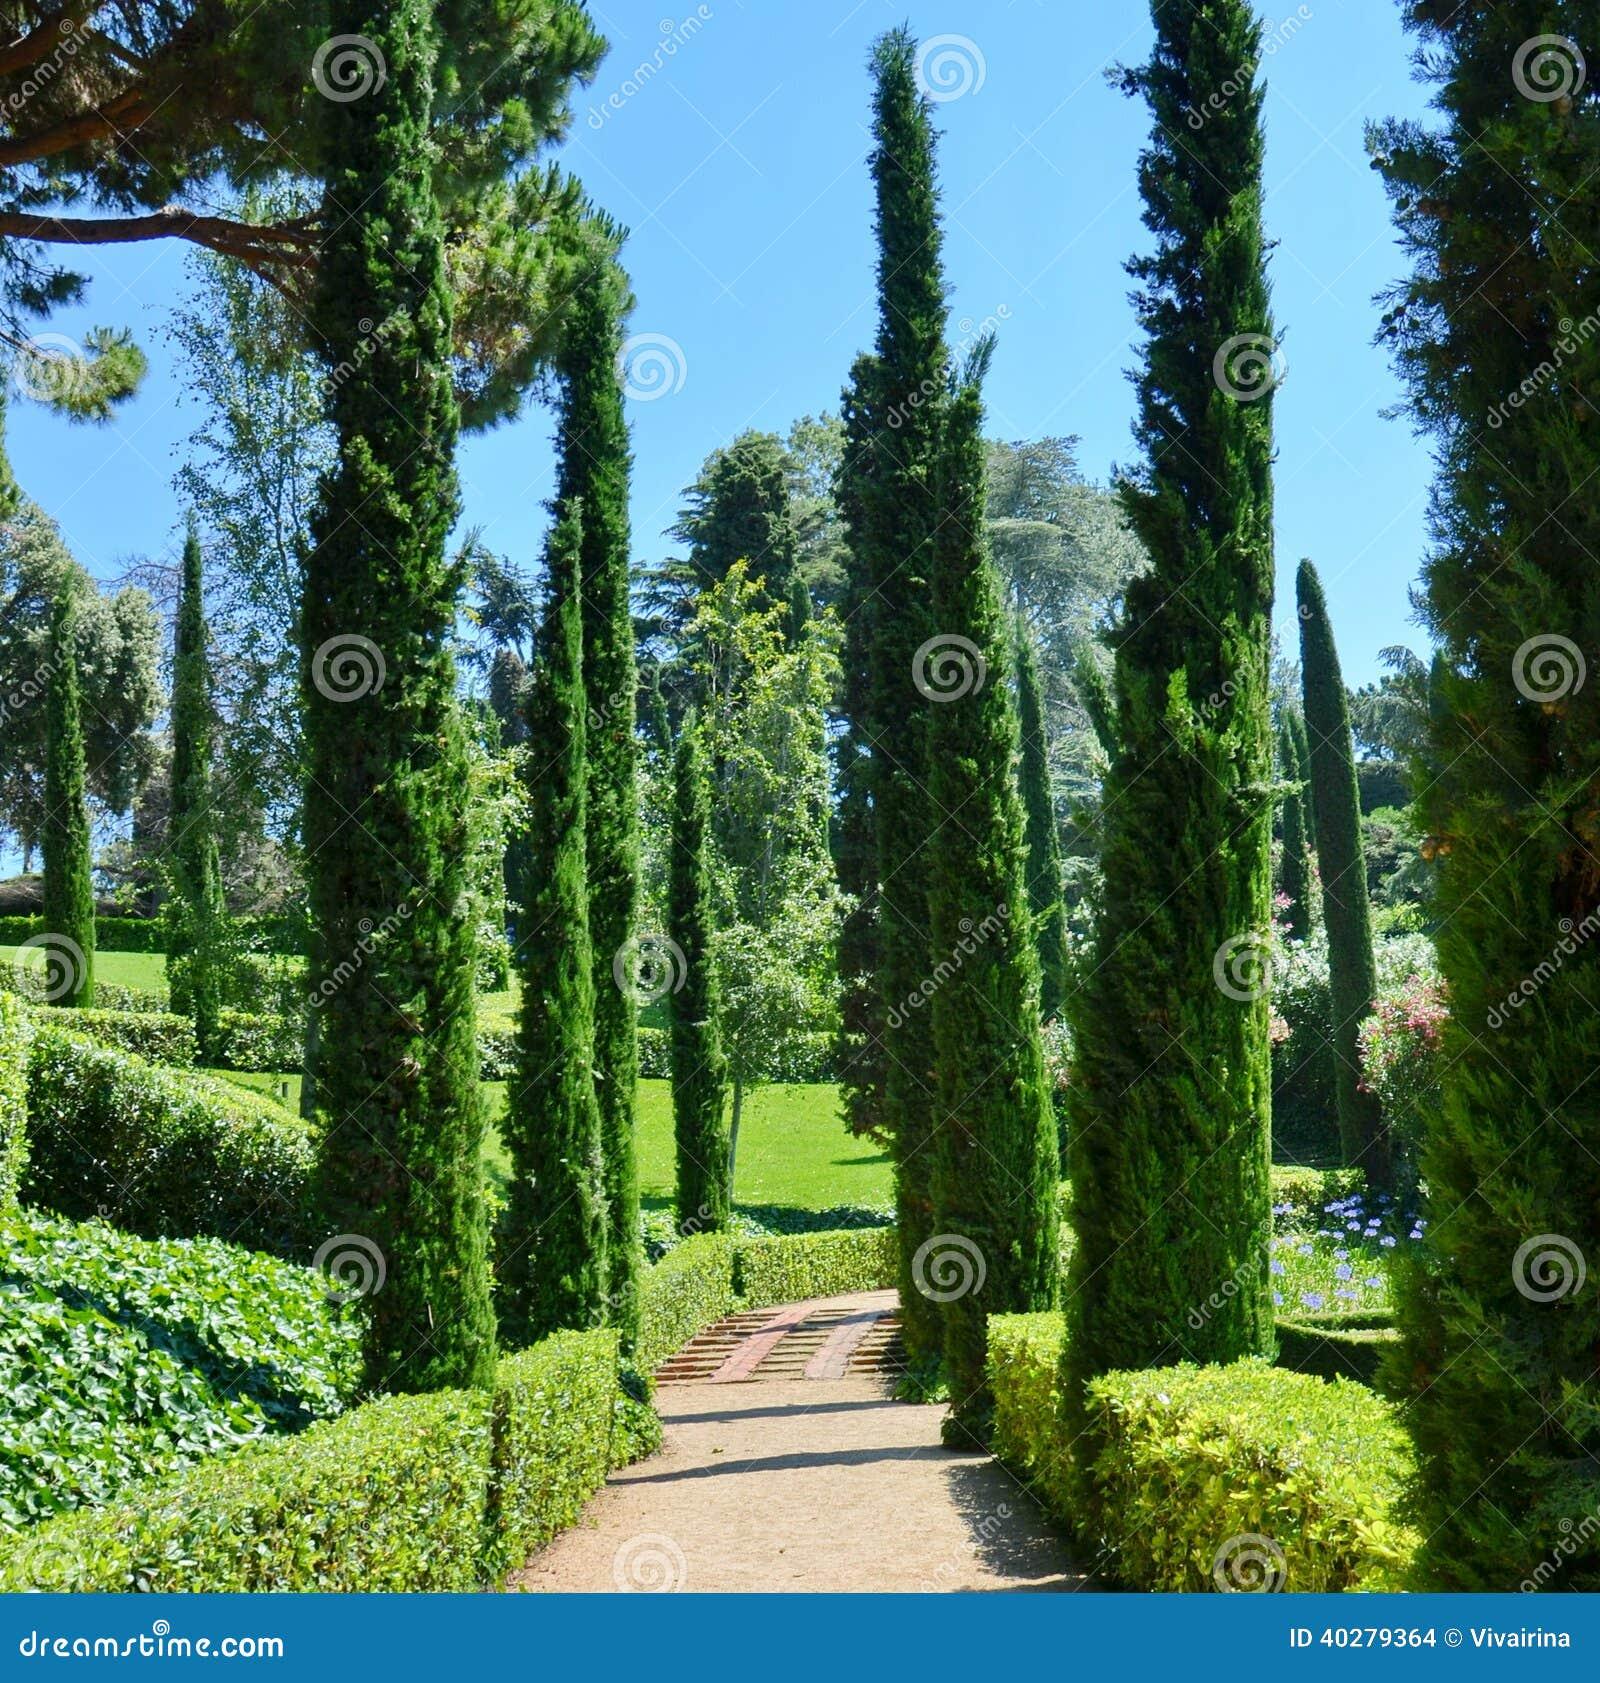 Панорамная концепция летних каникулов взгляда сада и парка